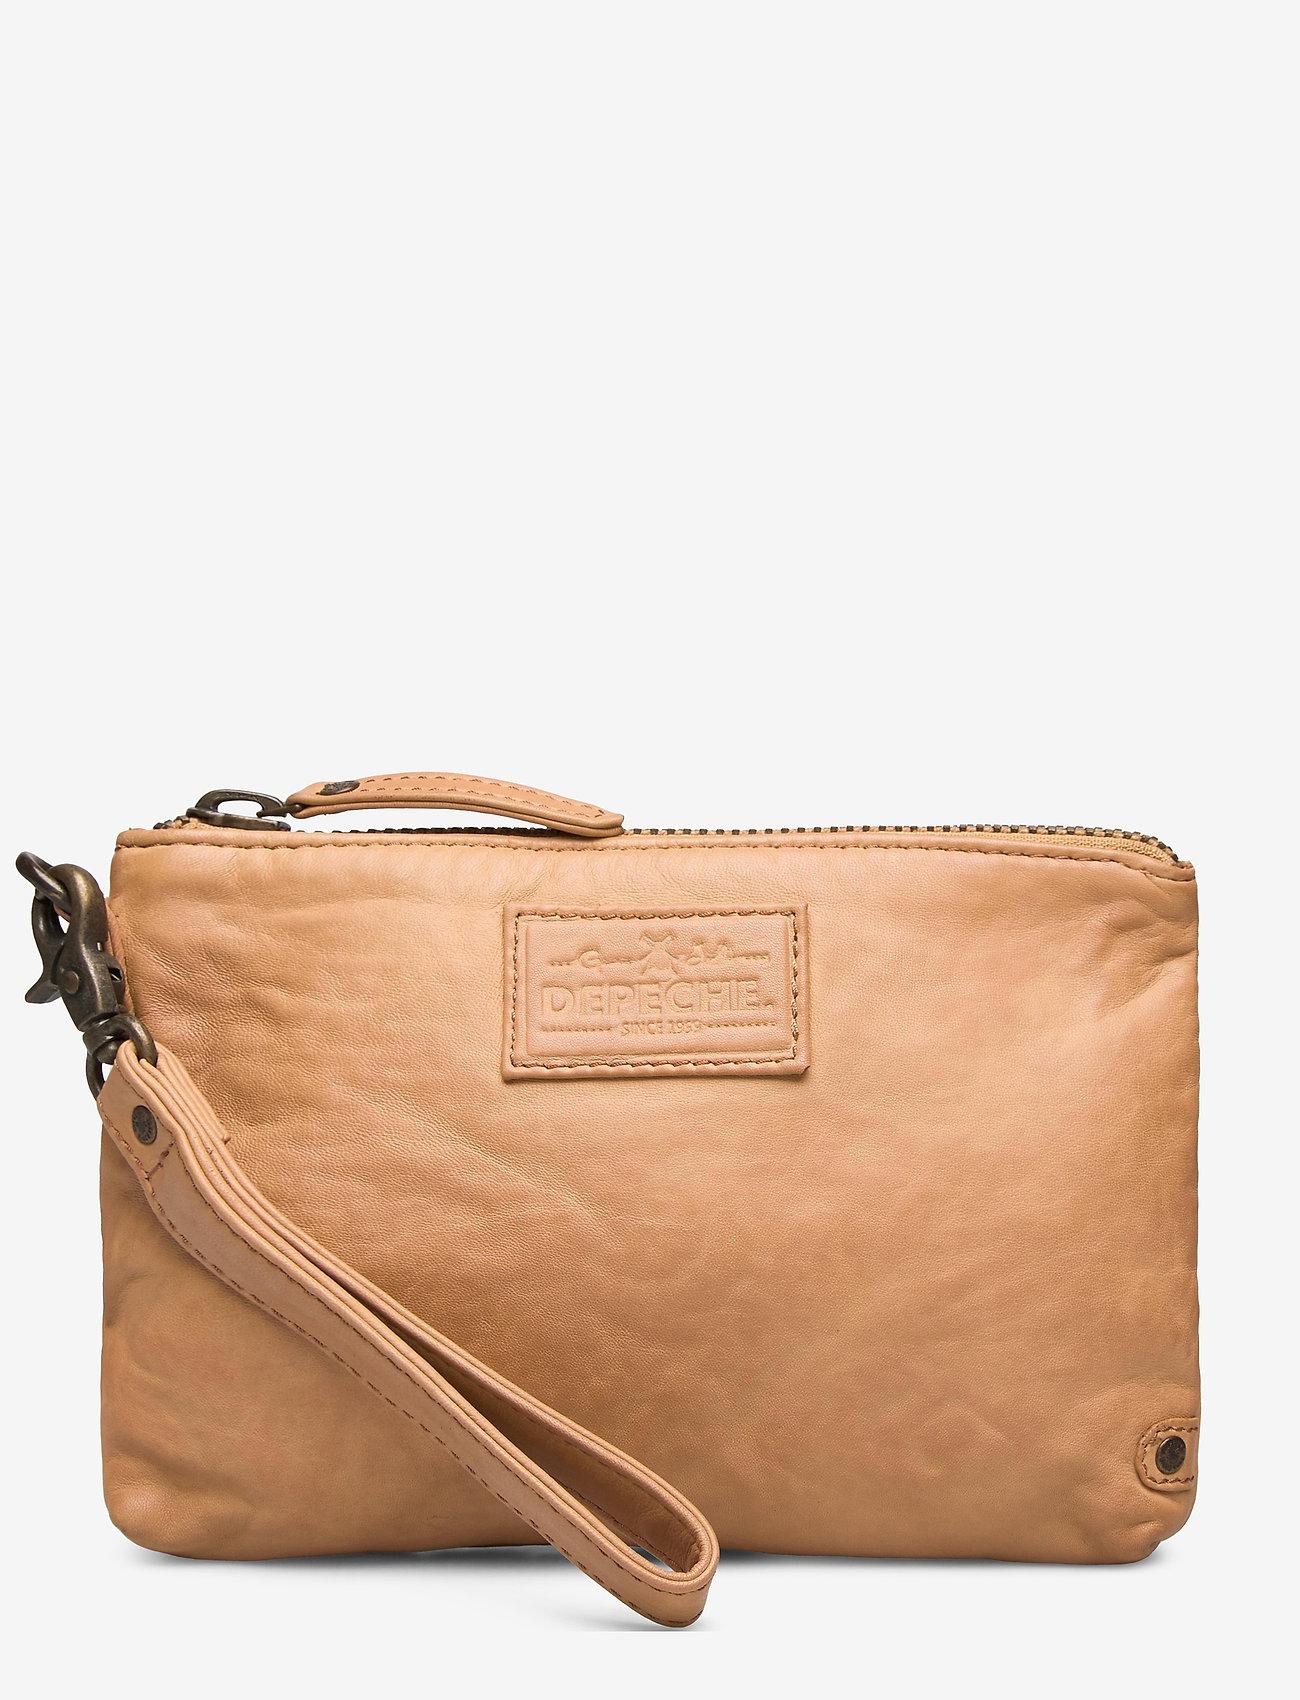 DEPECHE - Cosmetic bag - kirjekuorilaukut - 156 camel - 0